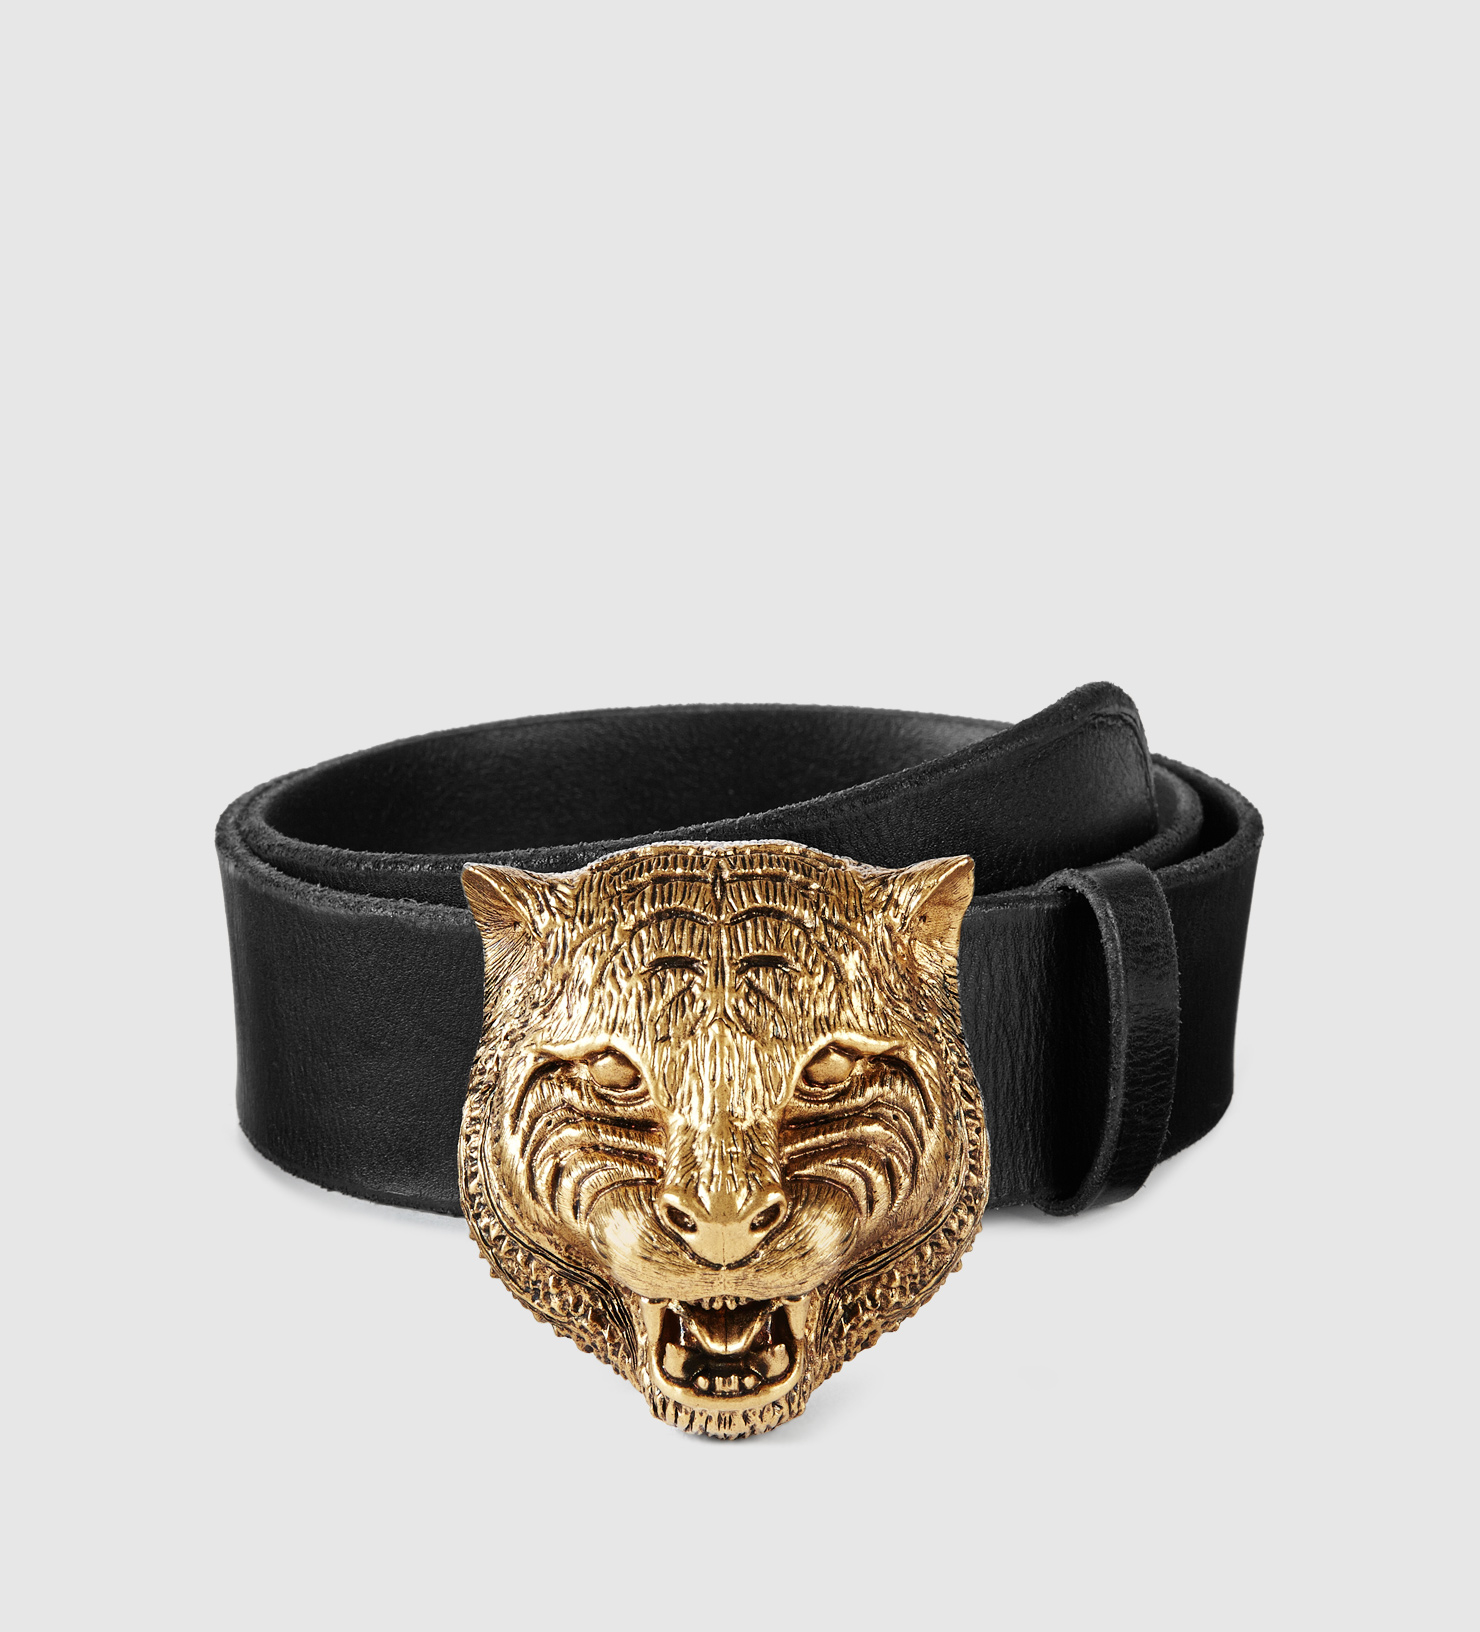 ed1c43c00 Gucci Leather Belt With Feline Buckle in Metallic - Lyst